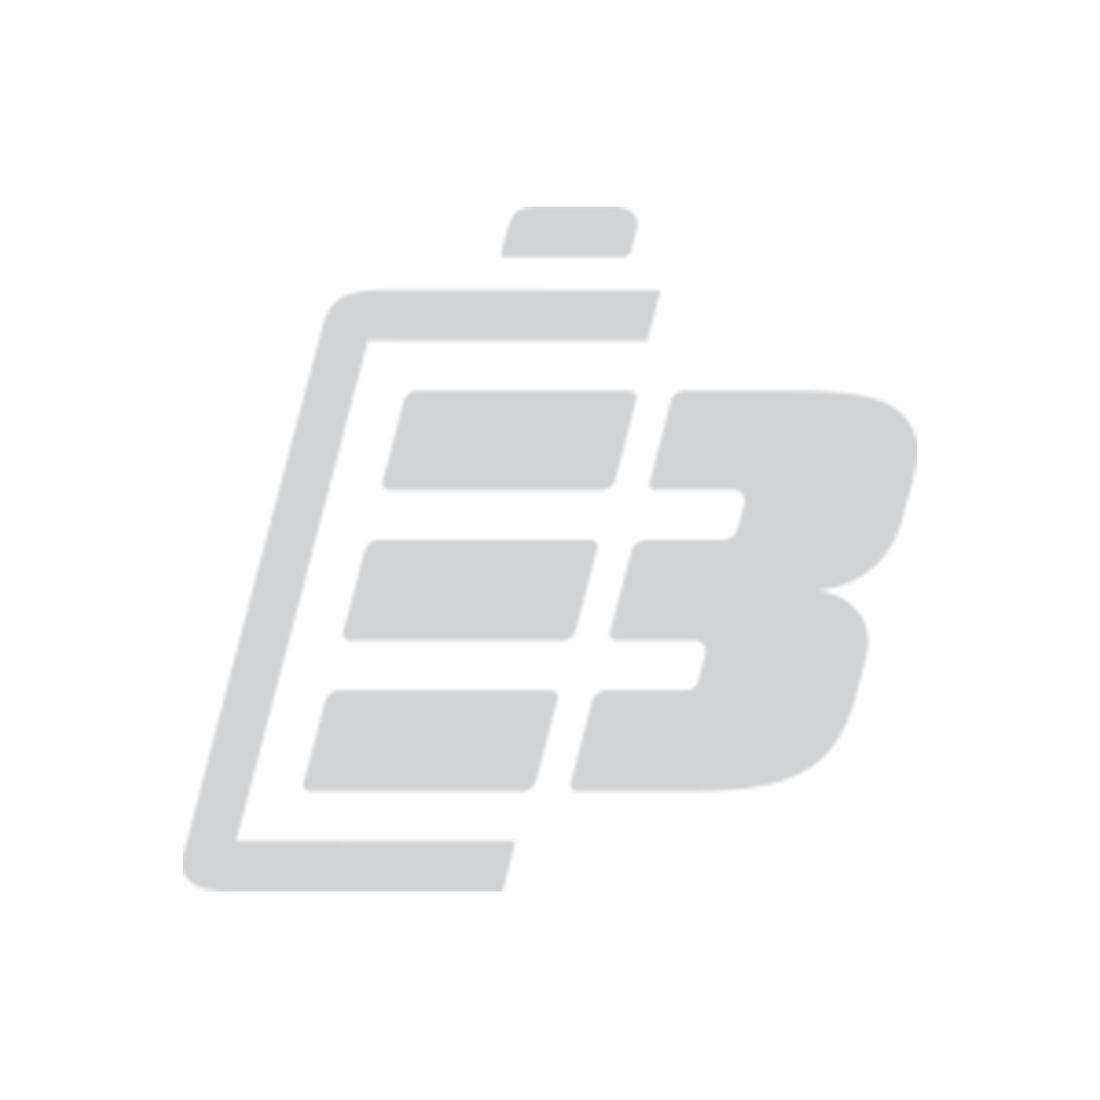 Cordless phone battery Panasonic KX-A36_1